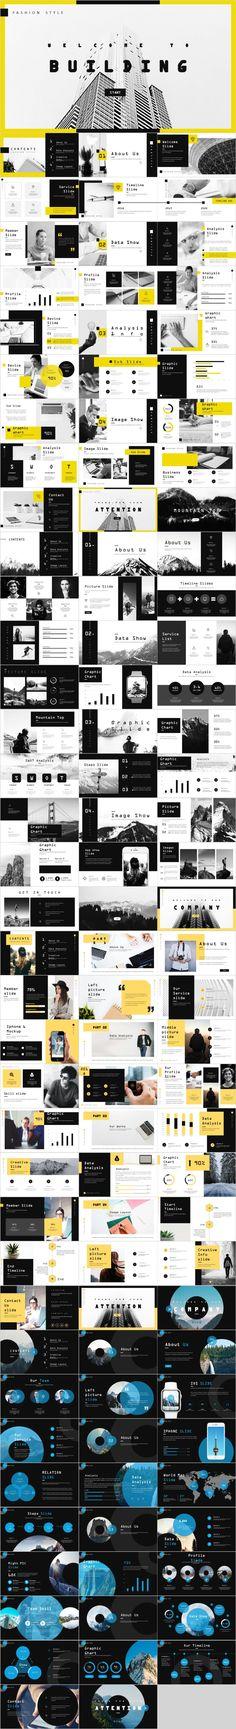 4 in 1 fashion company design PowerPoint template Powerpoint Design Templates, Professional Powerpoint Templates, Ppt Design, Keynote Template, Layout Design, Design Elements, Design Art, Portfolio Presentation, Presentation Design